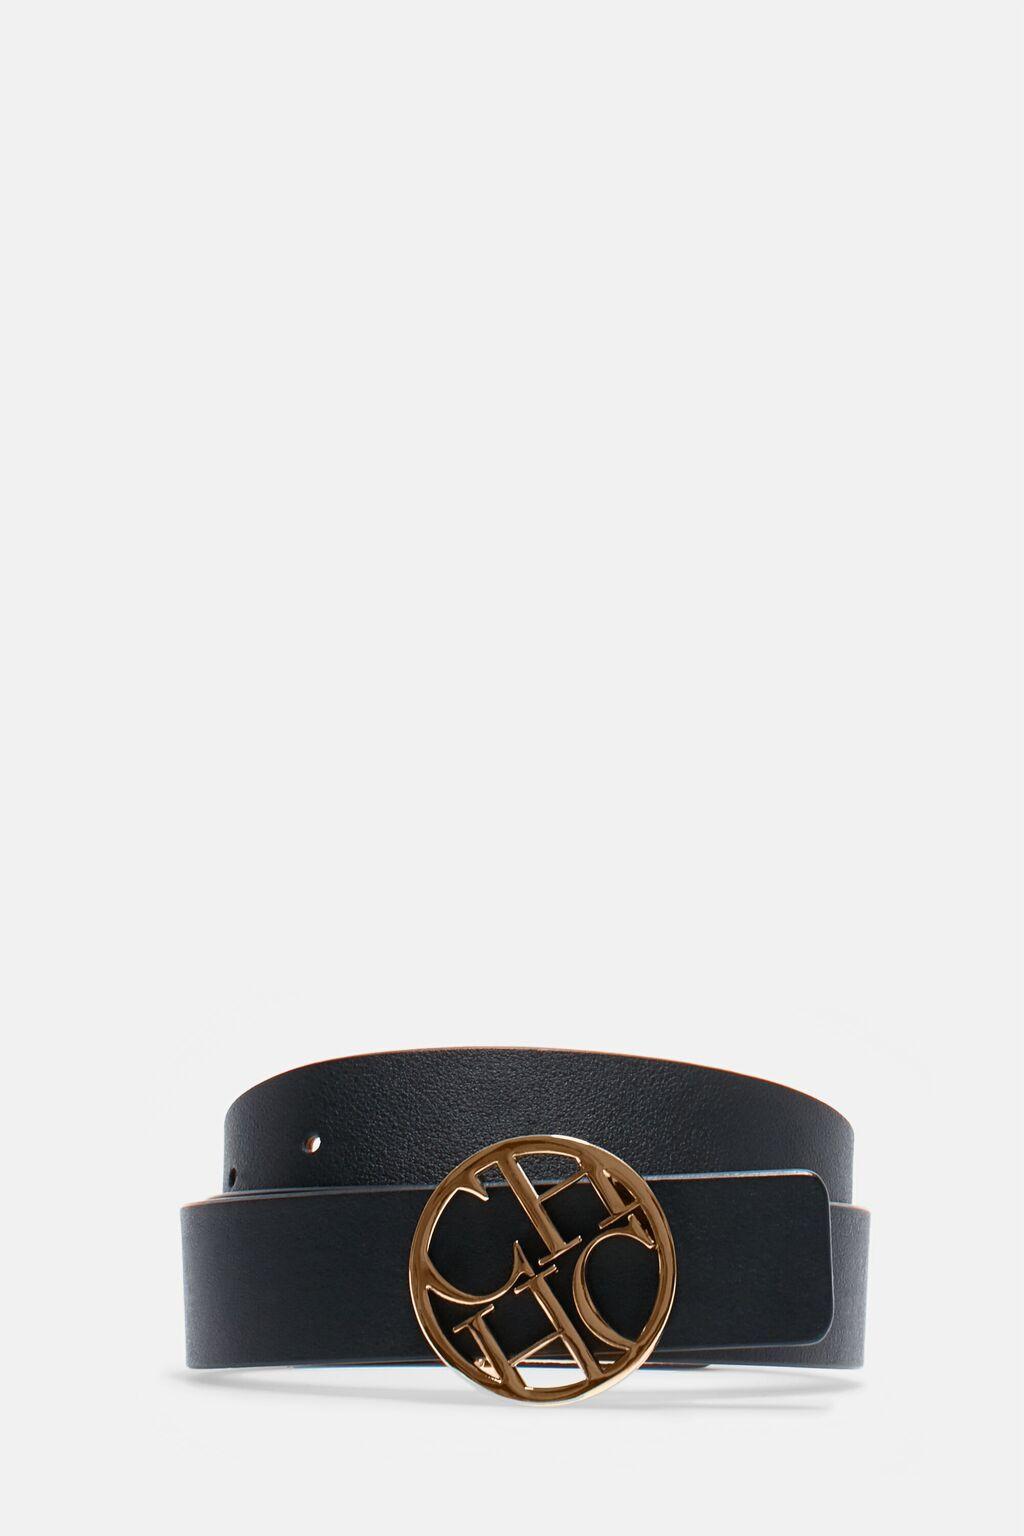 CH medallion leather belt